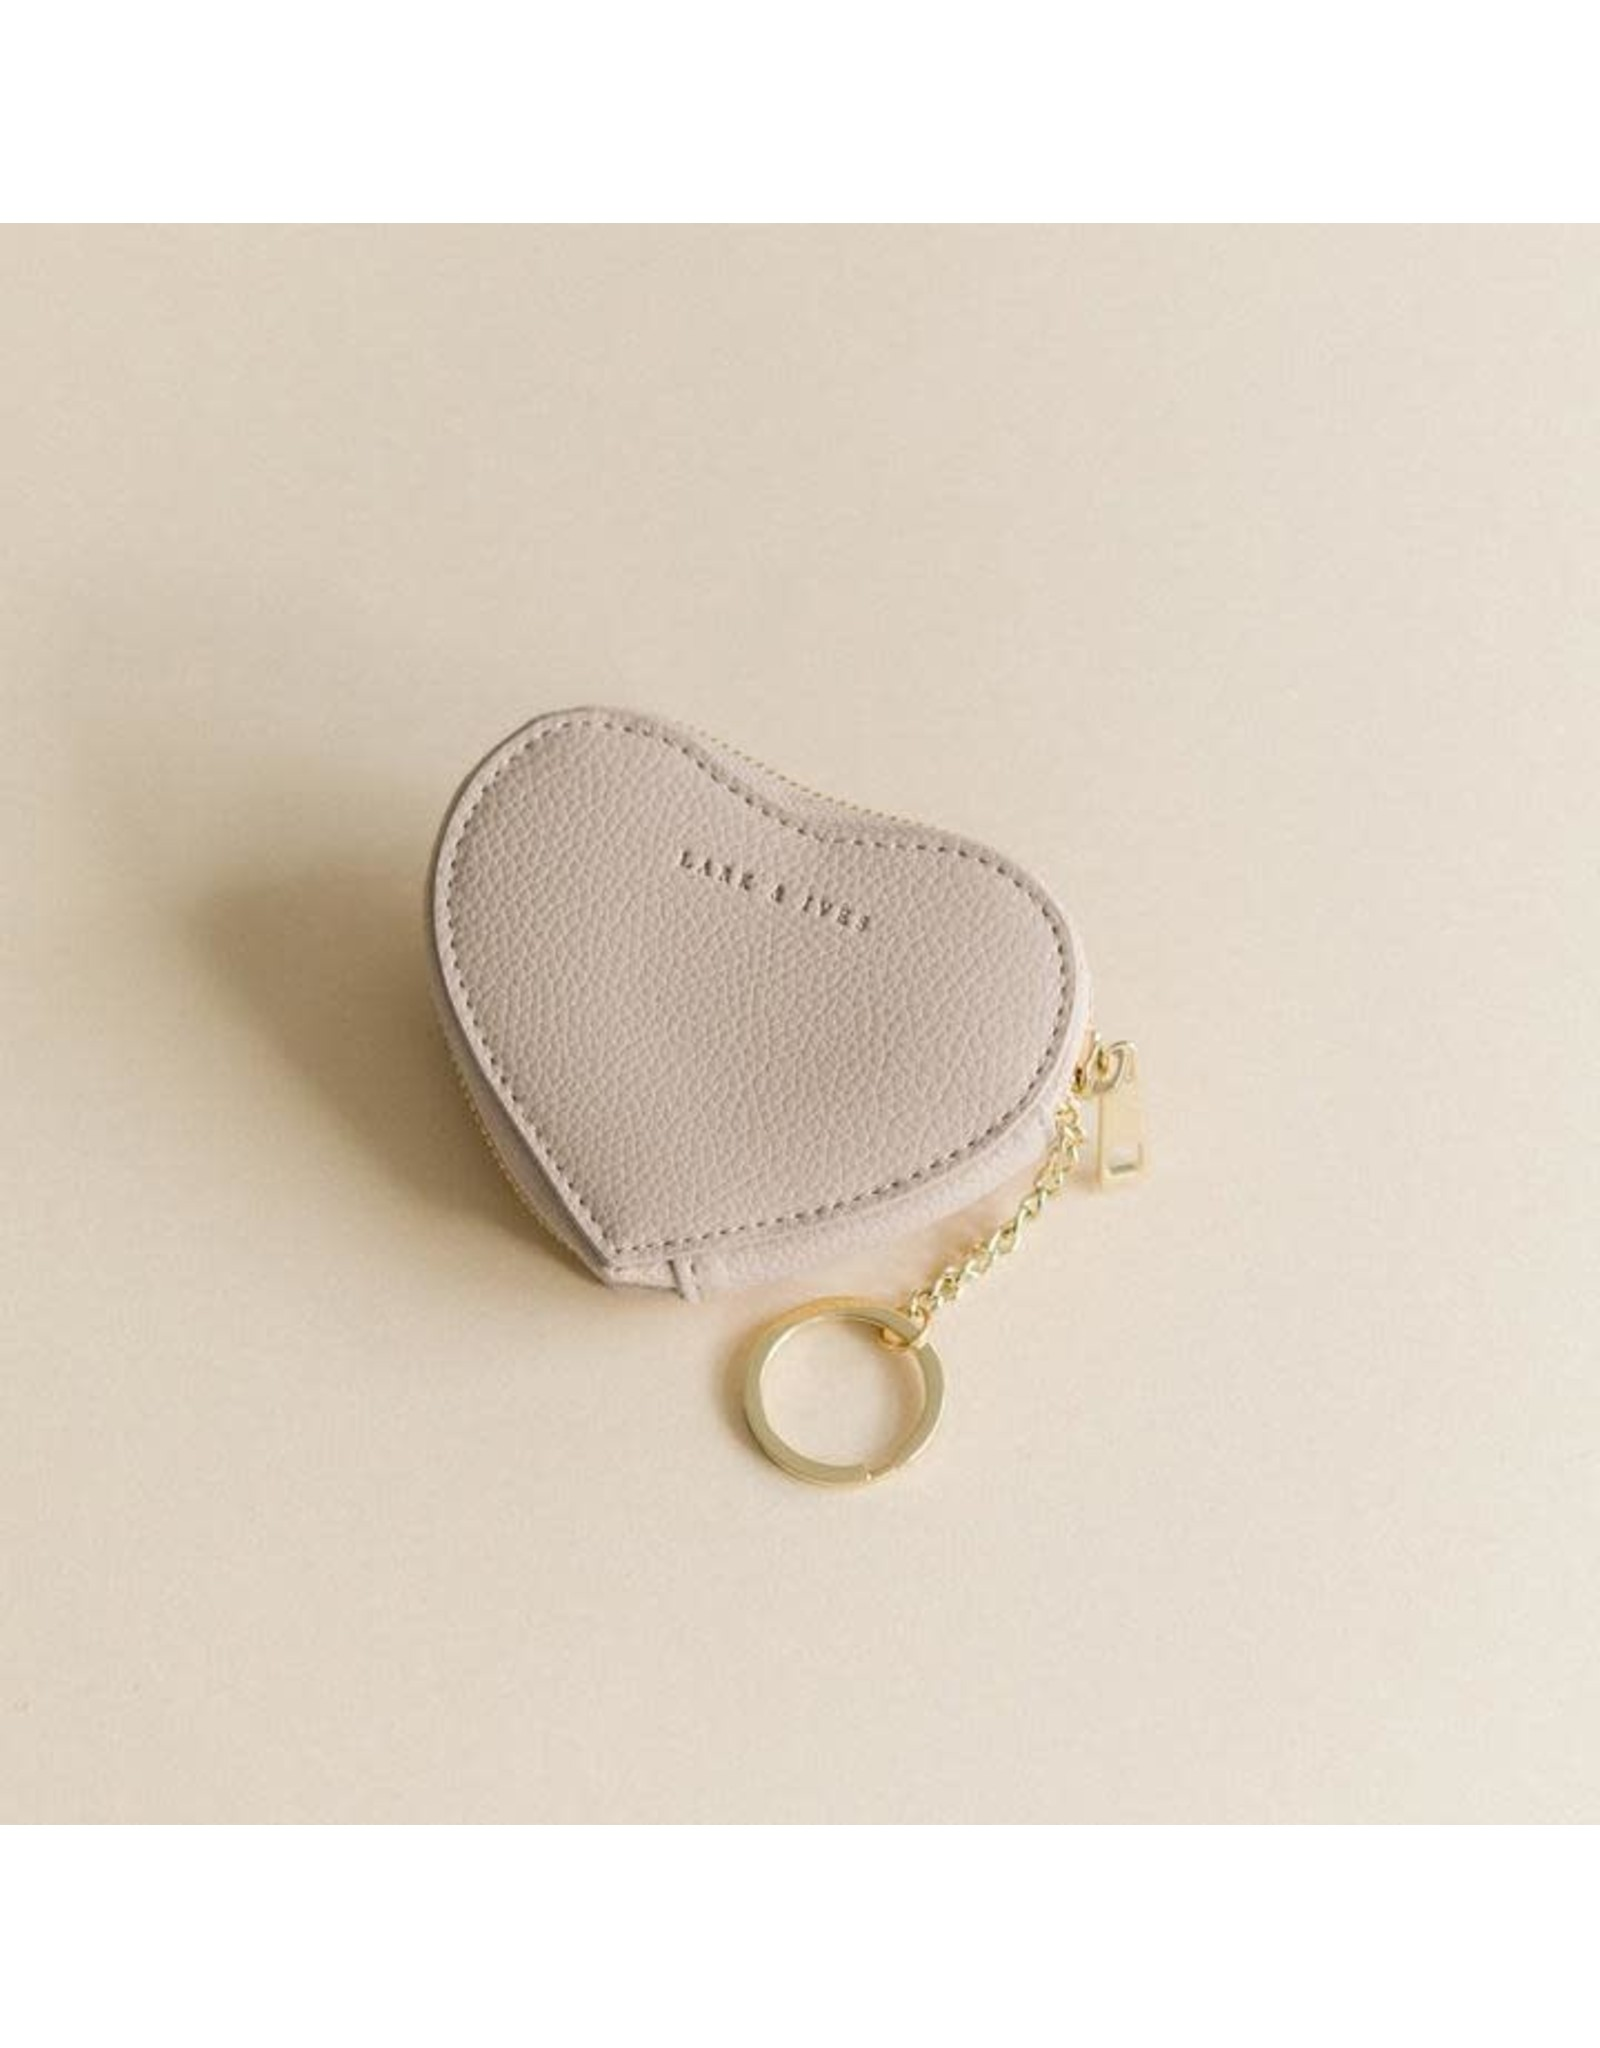 Lark & Ives Heart Coin Purse